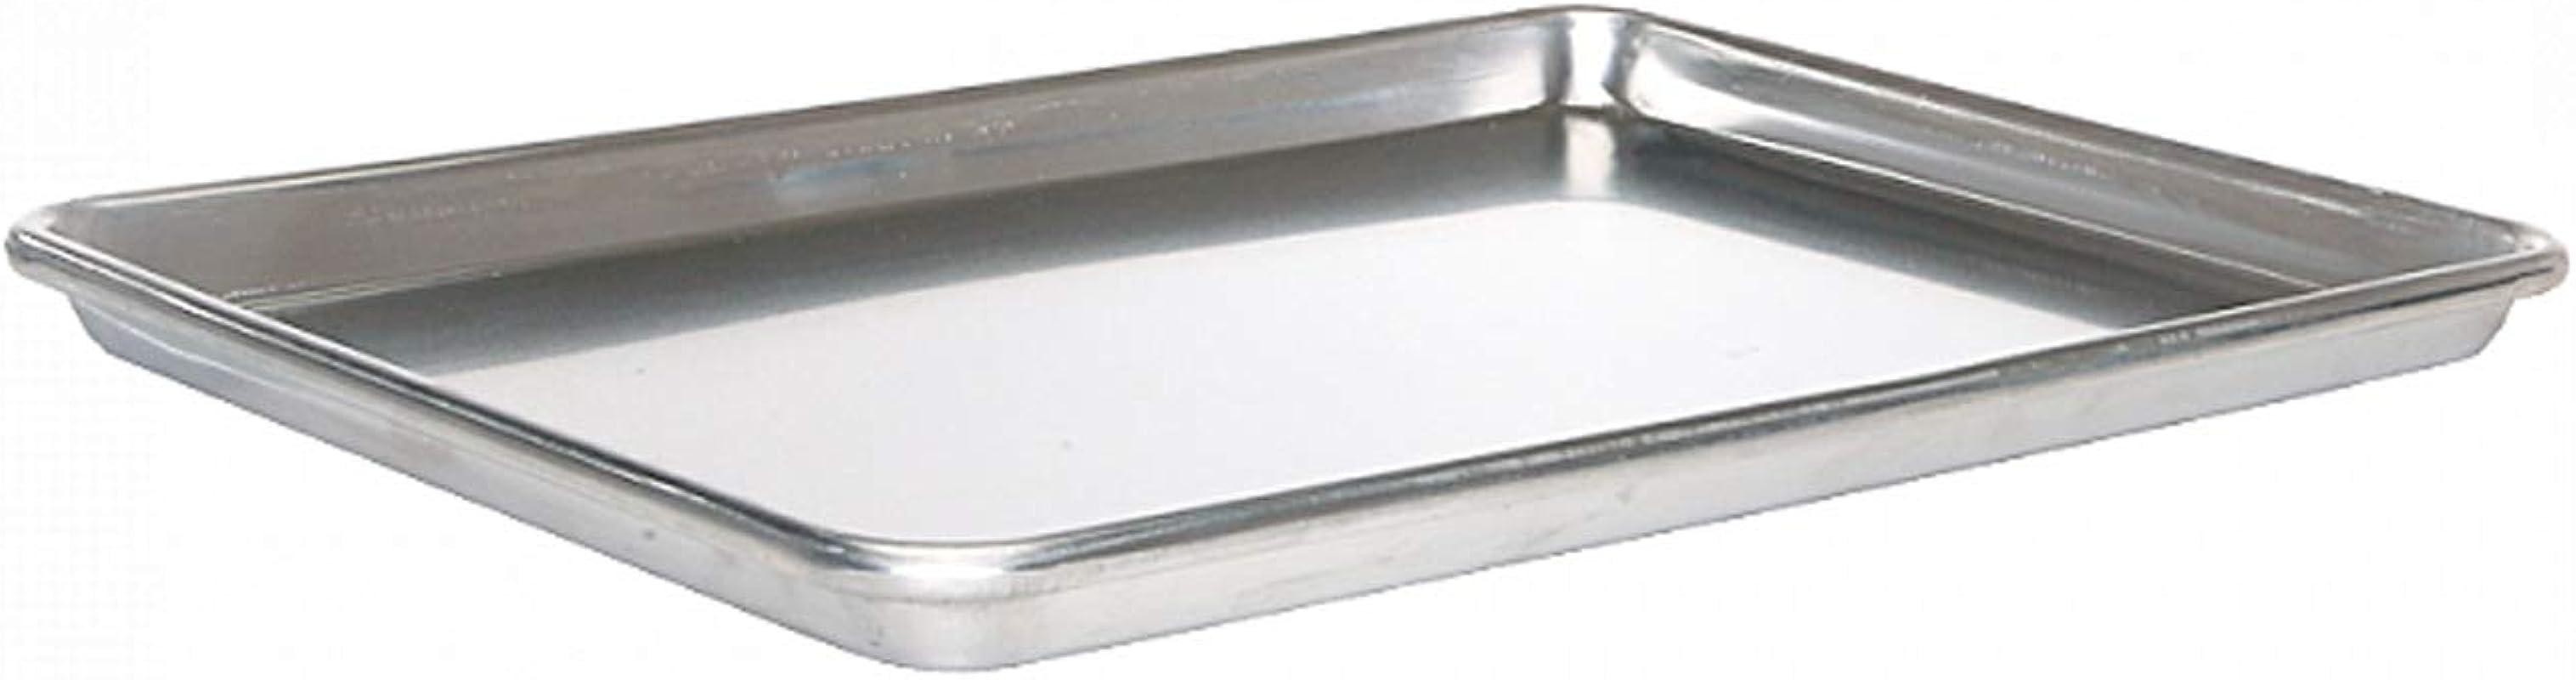 1 X 9 X 13 Quarter Size Sheet Bake Pan